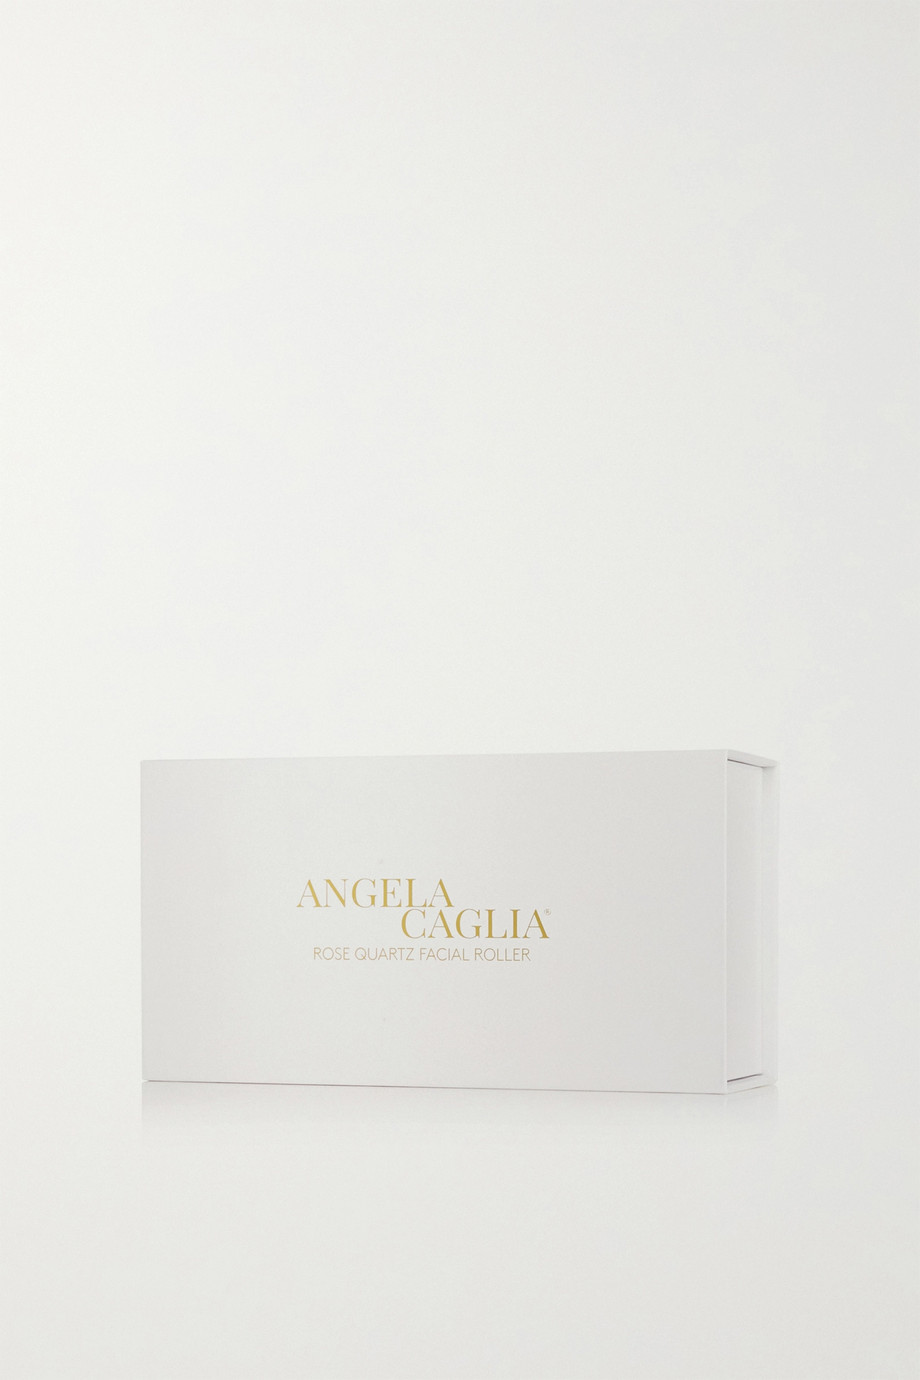 Angela Caglia La Vie en Rose Face Roller – Gesichtsmassagegerät